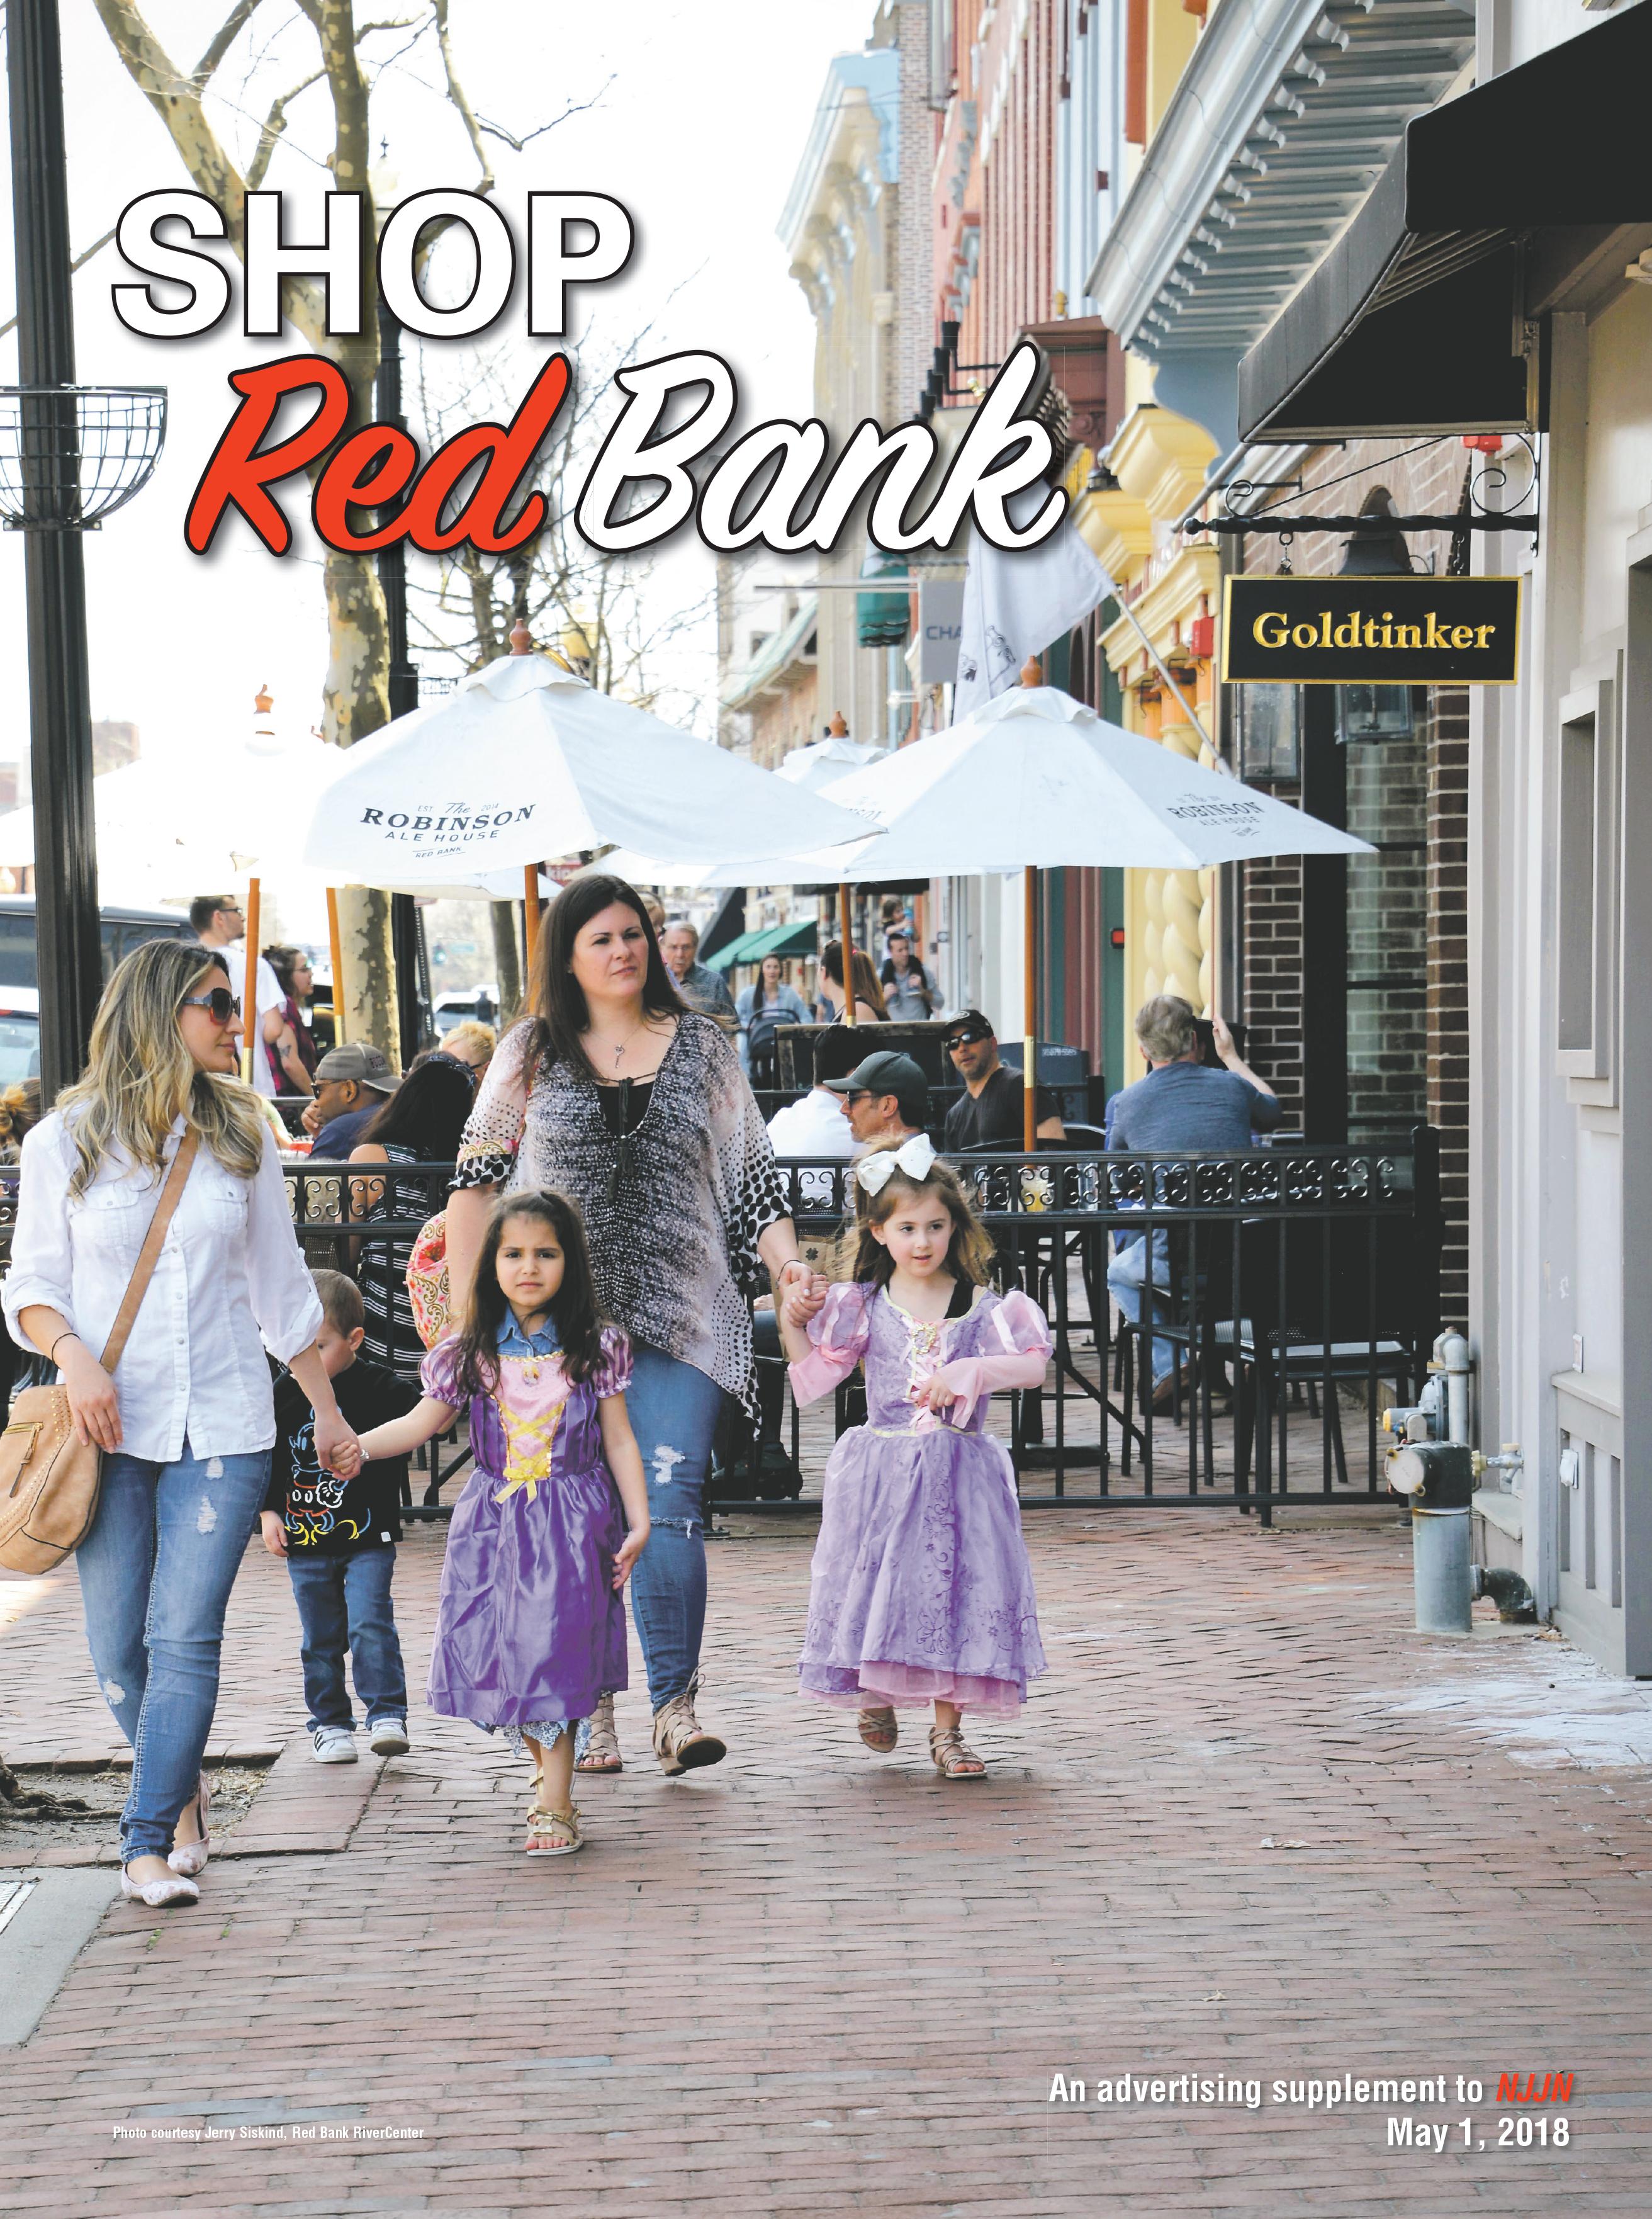 Shop Red Bank 05_01_18.indd